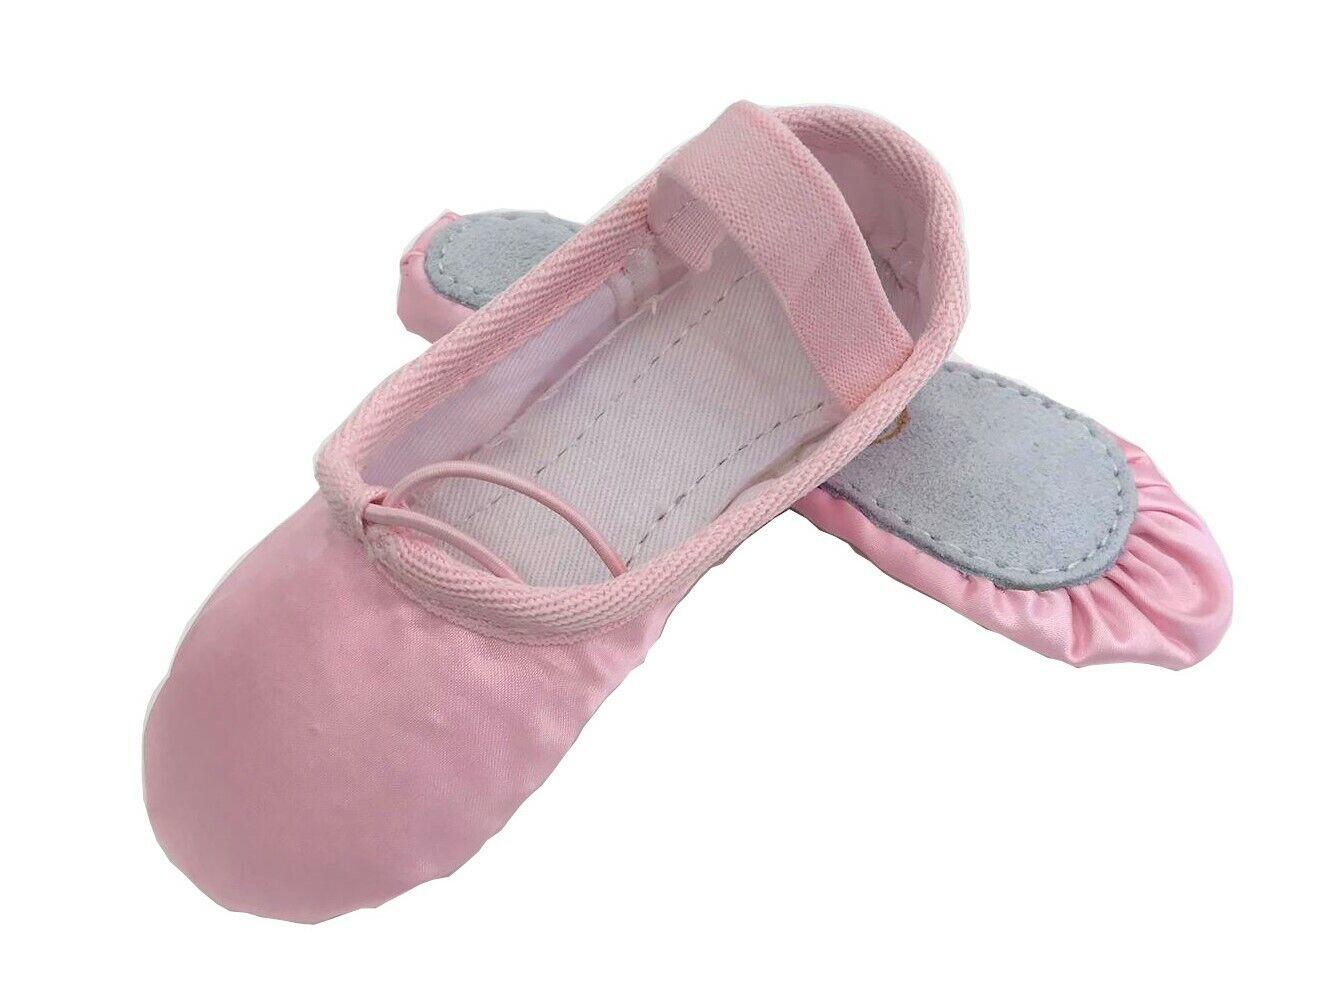 Satin Ballet Shoes Full Sole Pink Pre-sewn Elastics